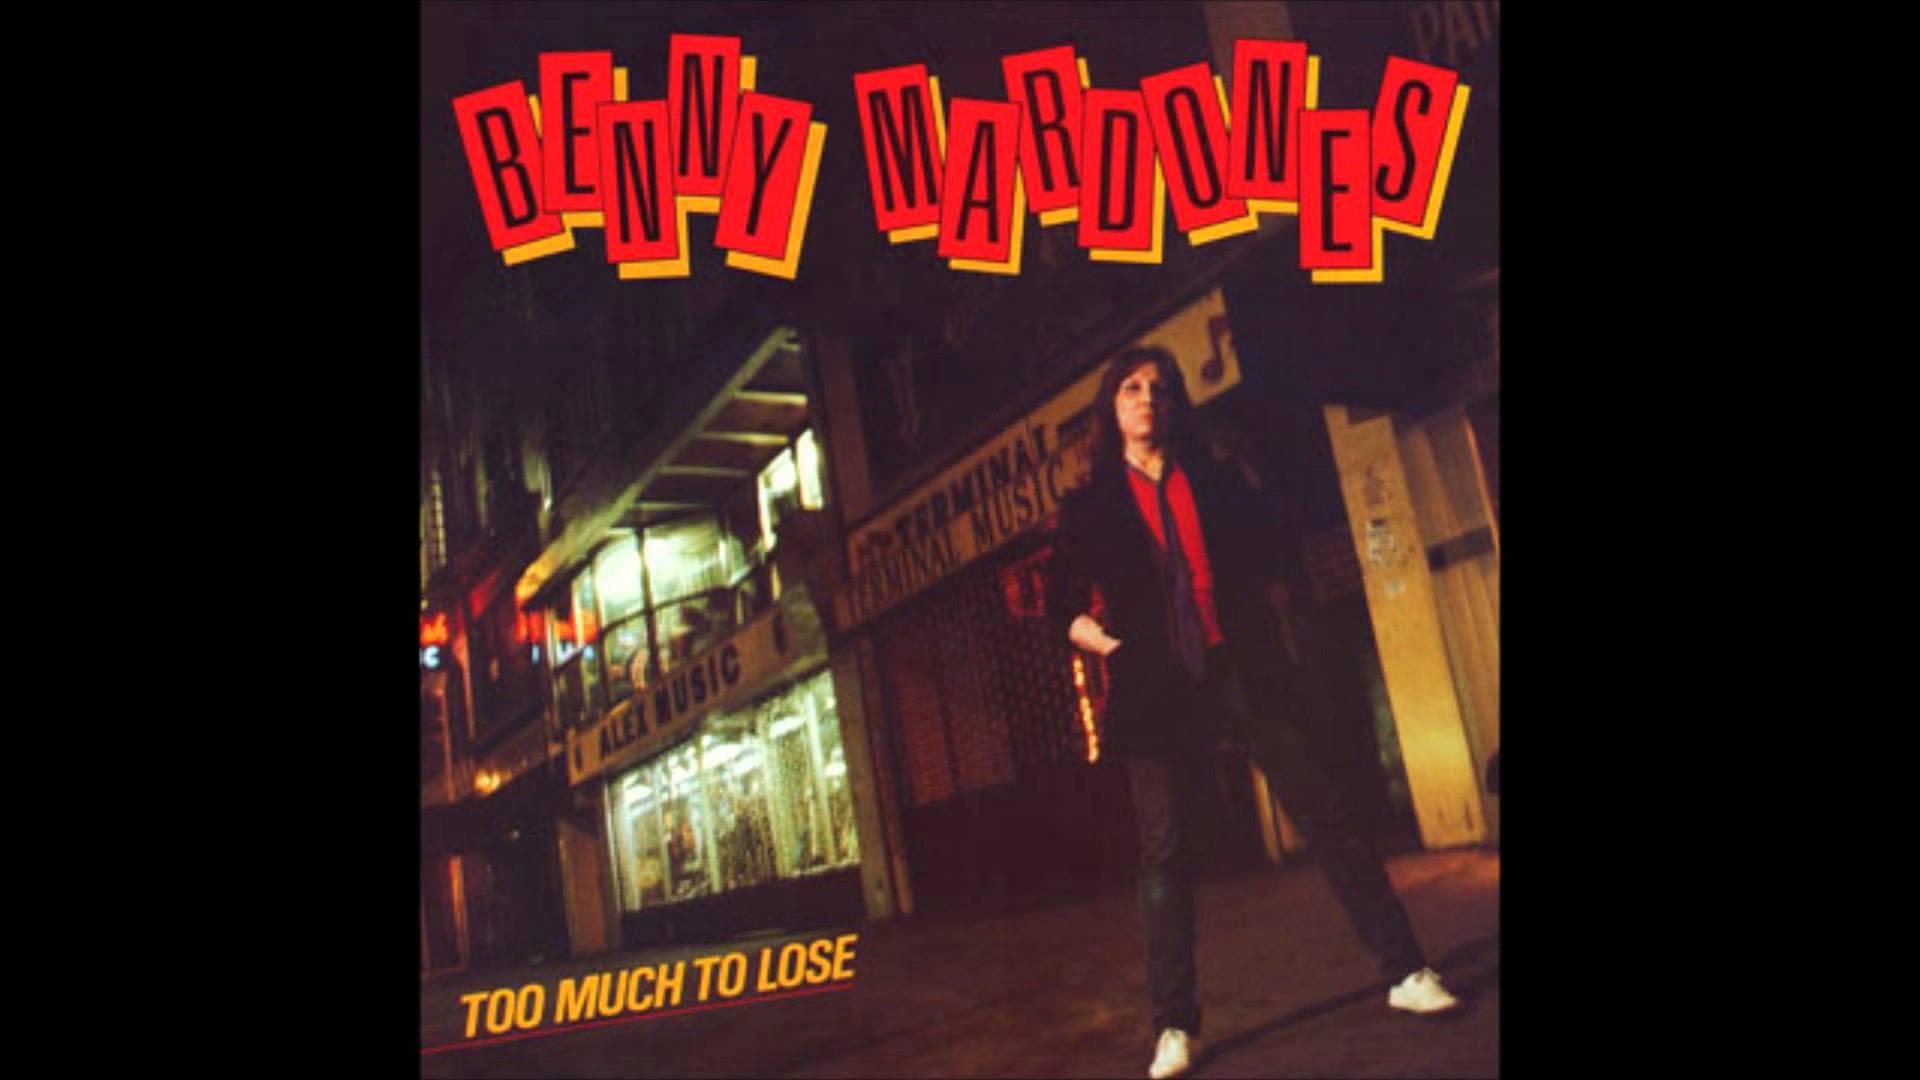 benny-mardones-too-much-to-lose